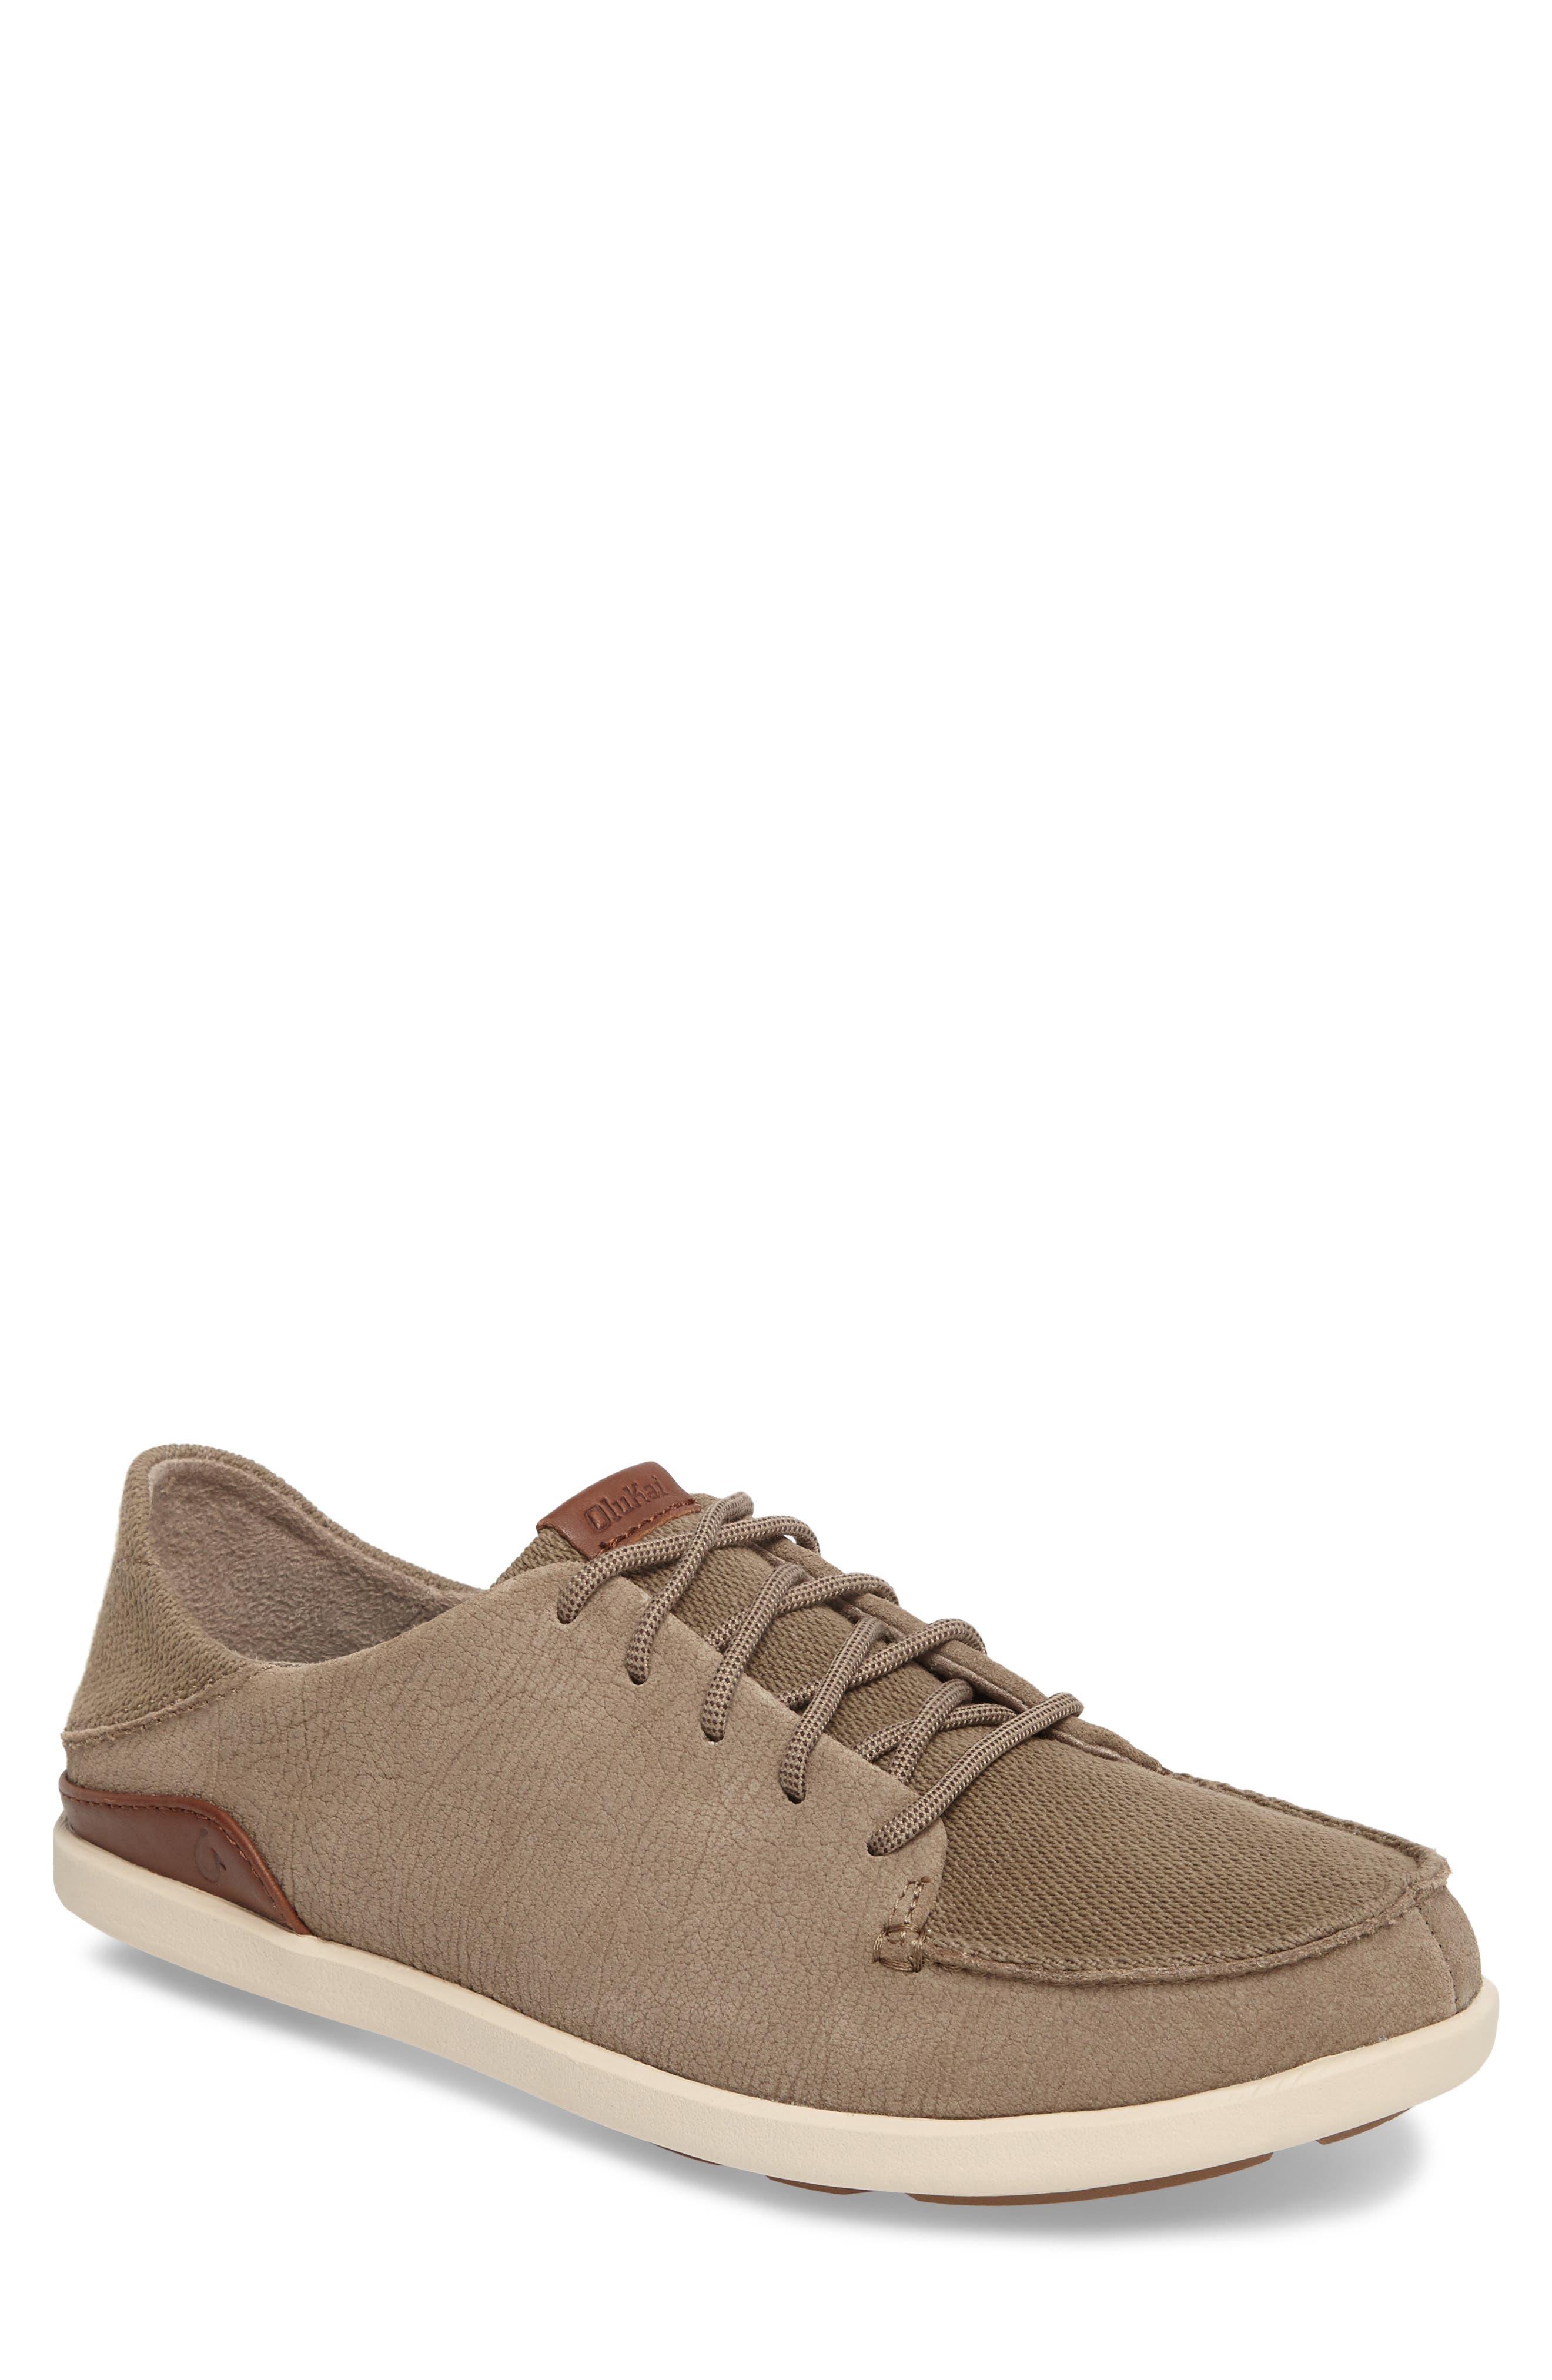 Olukai Men's Manoa Collapsible Sneaker VJyTqECd8